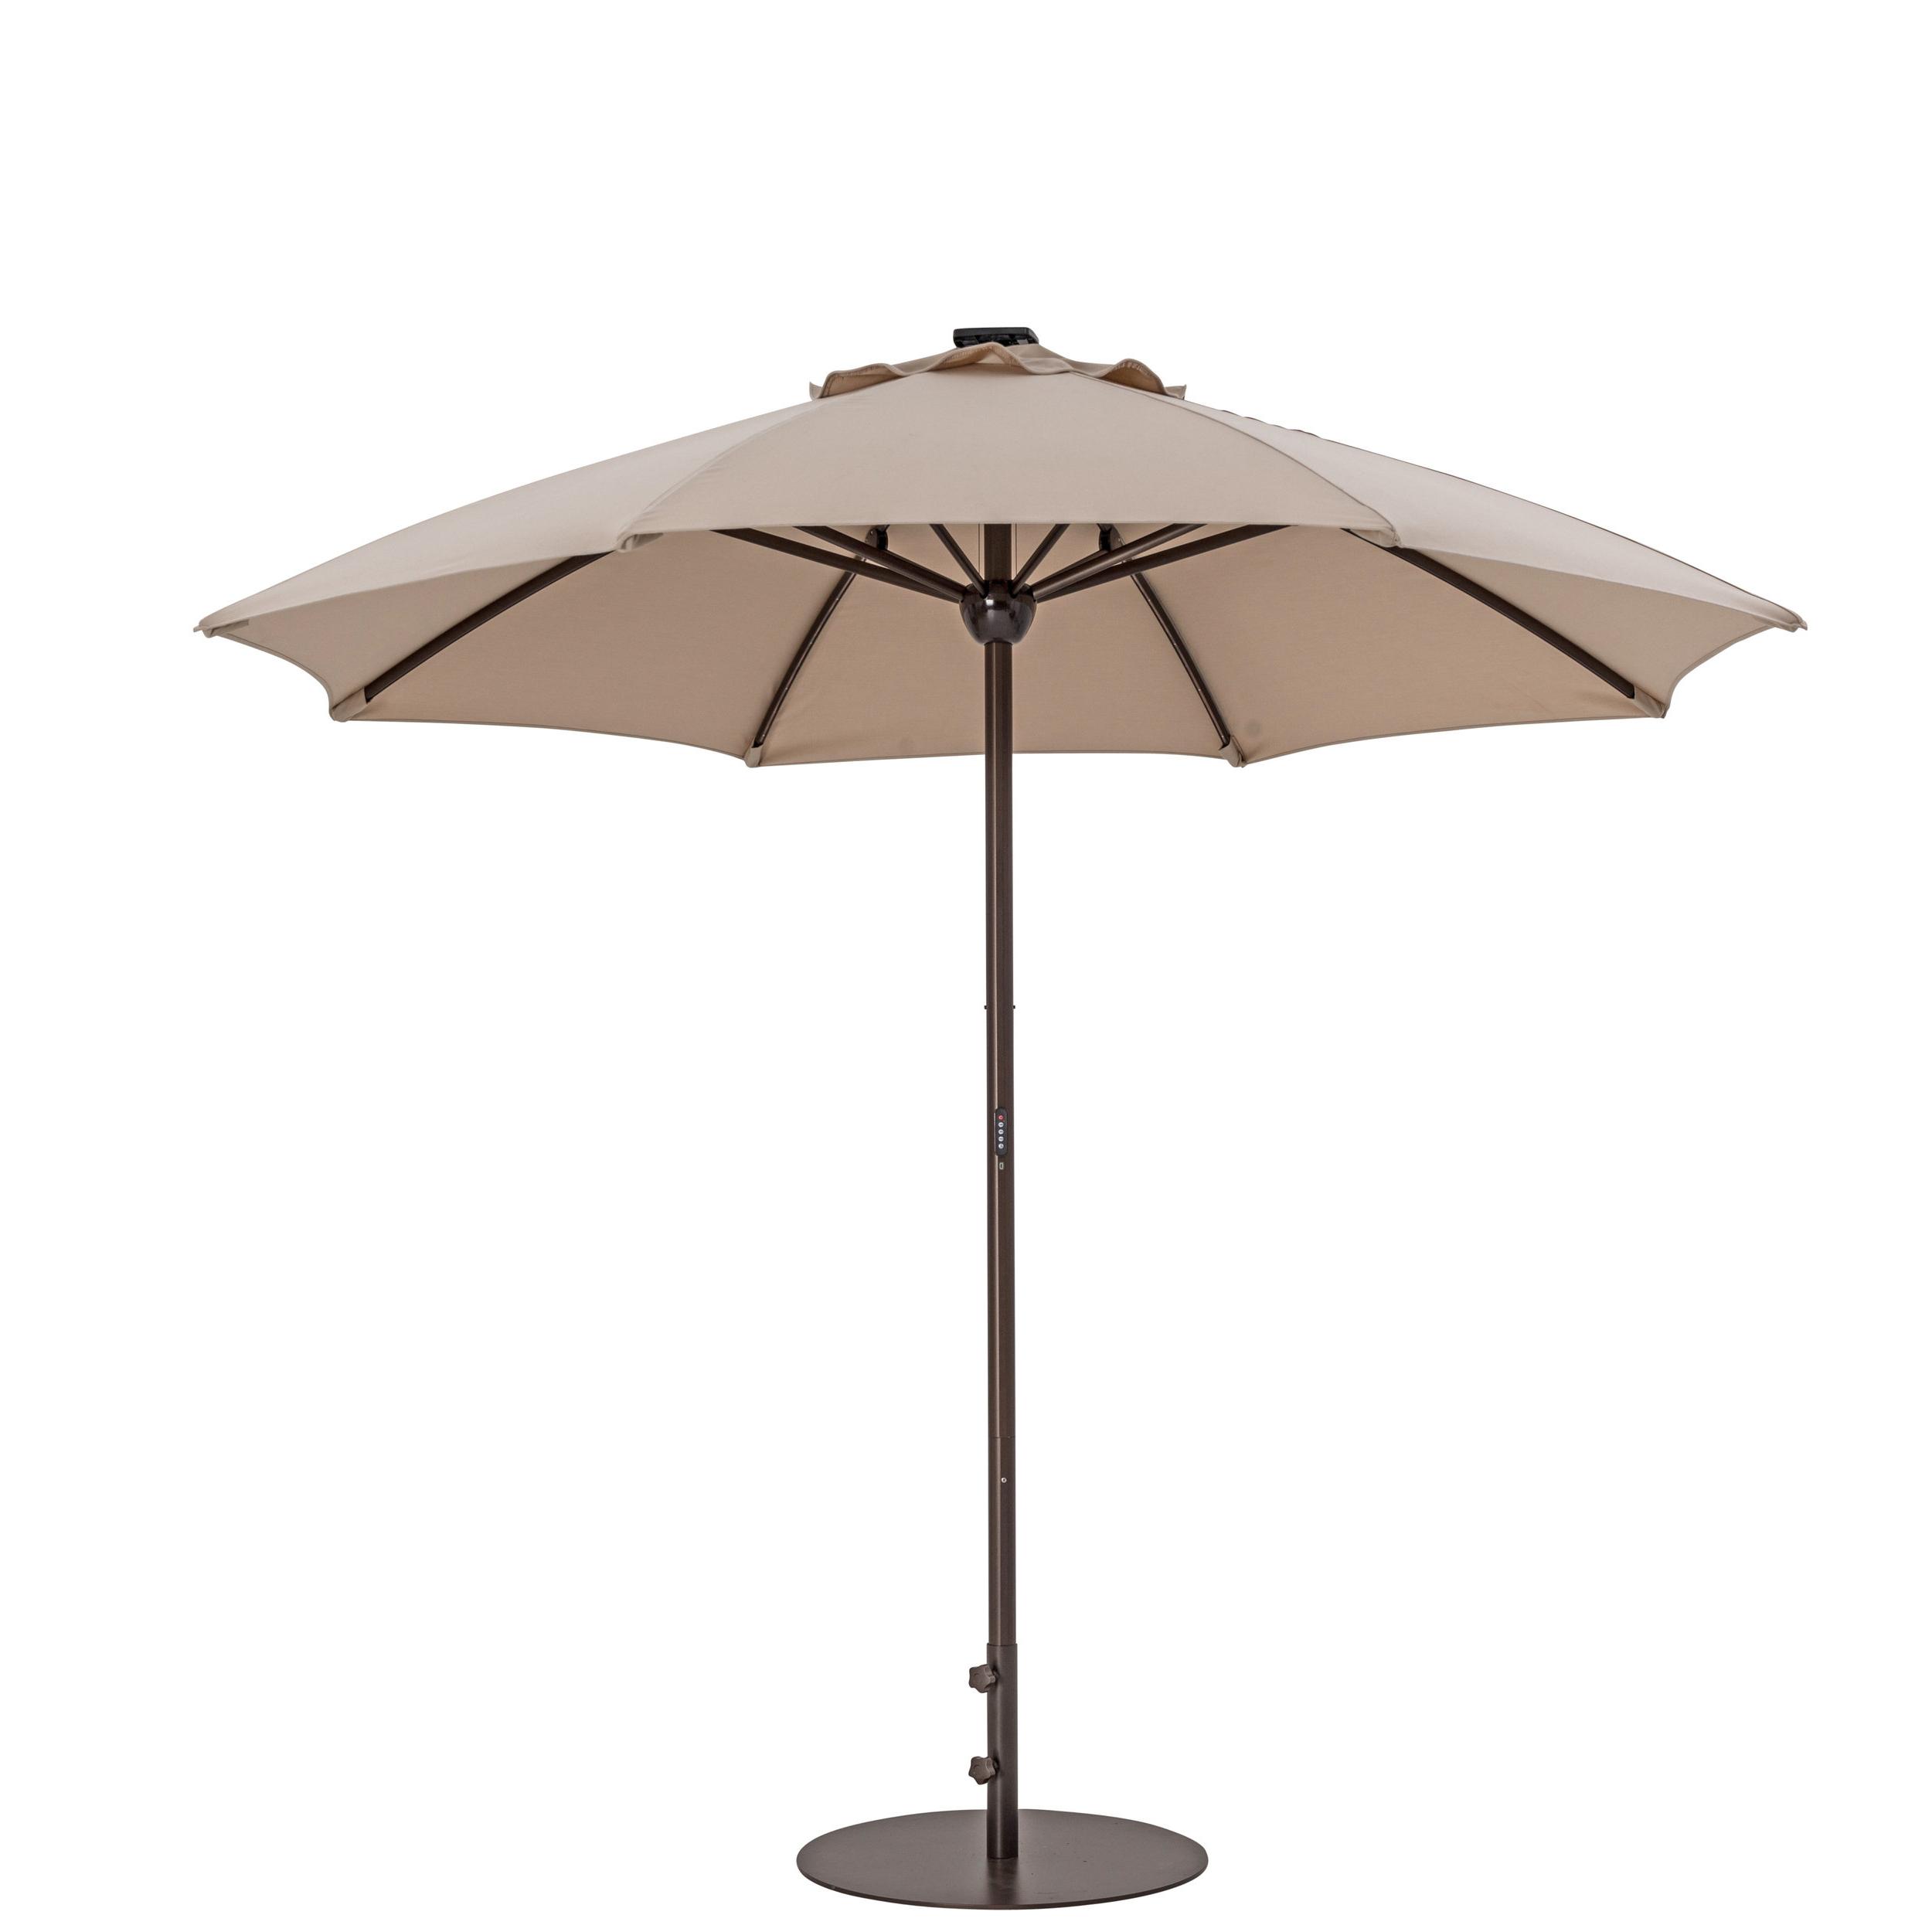 Hawkinge Market Umbrellas In Latest 9' Market Umbrella (View 6 of 20)